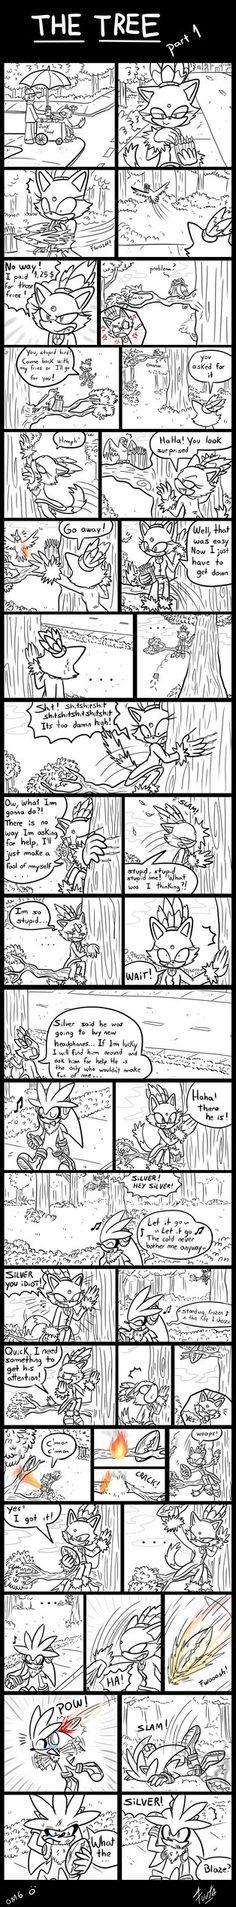 The Tree [Part 2] - (A Silver and Blaze Comic by Fuutachimaru on deviantART.com